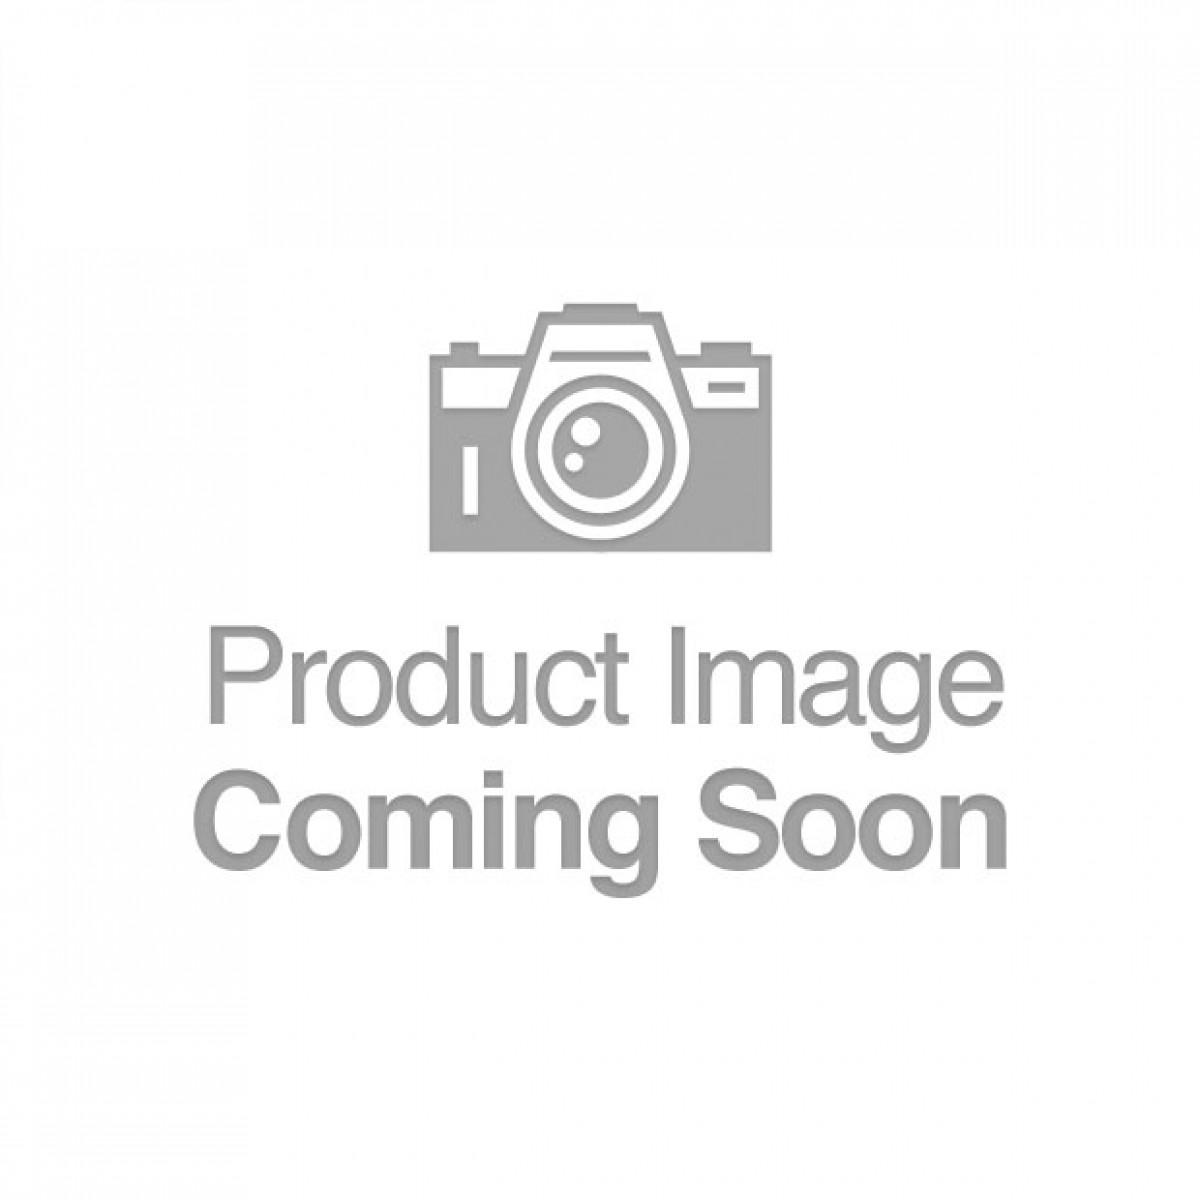 Kiiroo Onyx+ & Pearl2 Interactive Masturbator/Vibrator Kit - Purple